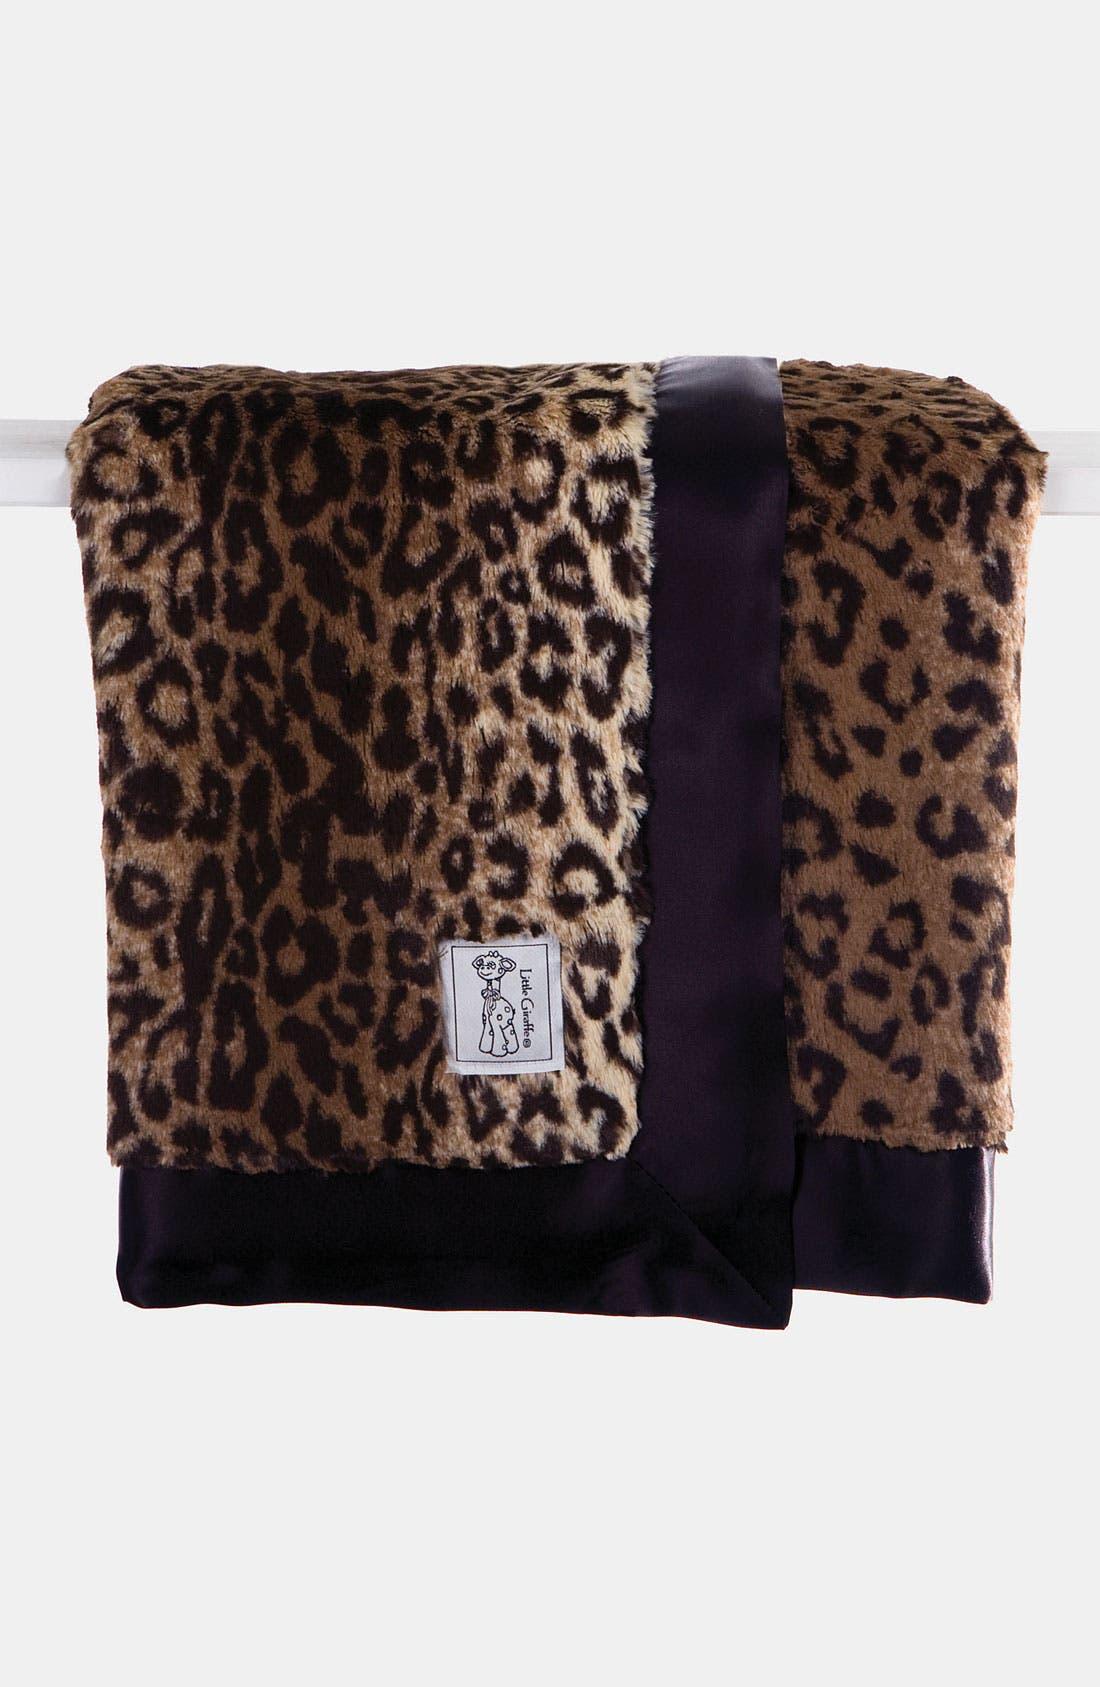 Leopard Print Blanket,                             Main thumbnail 1, color,                             Espresso